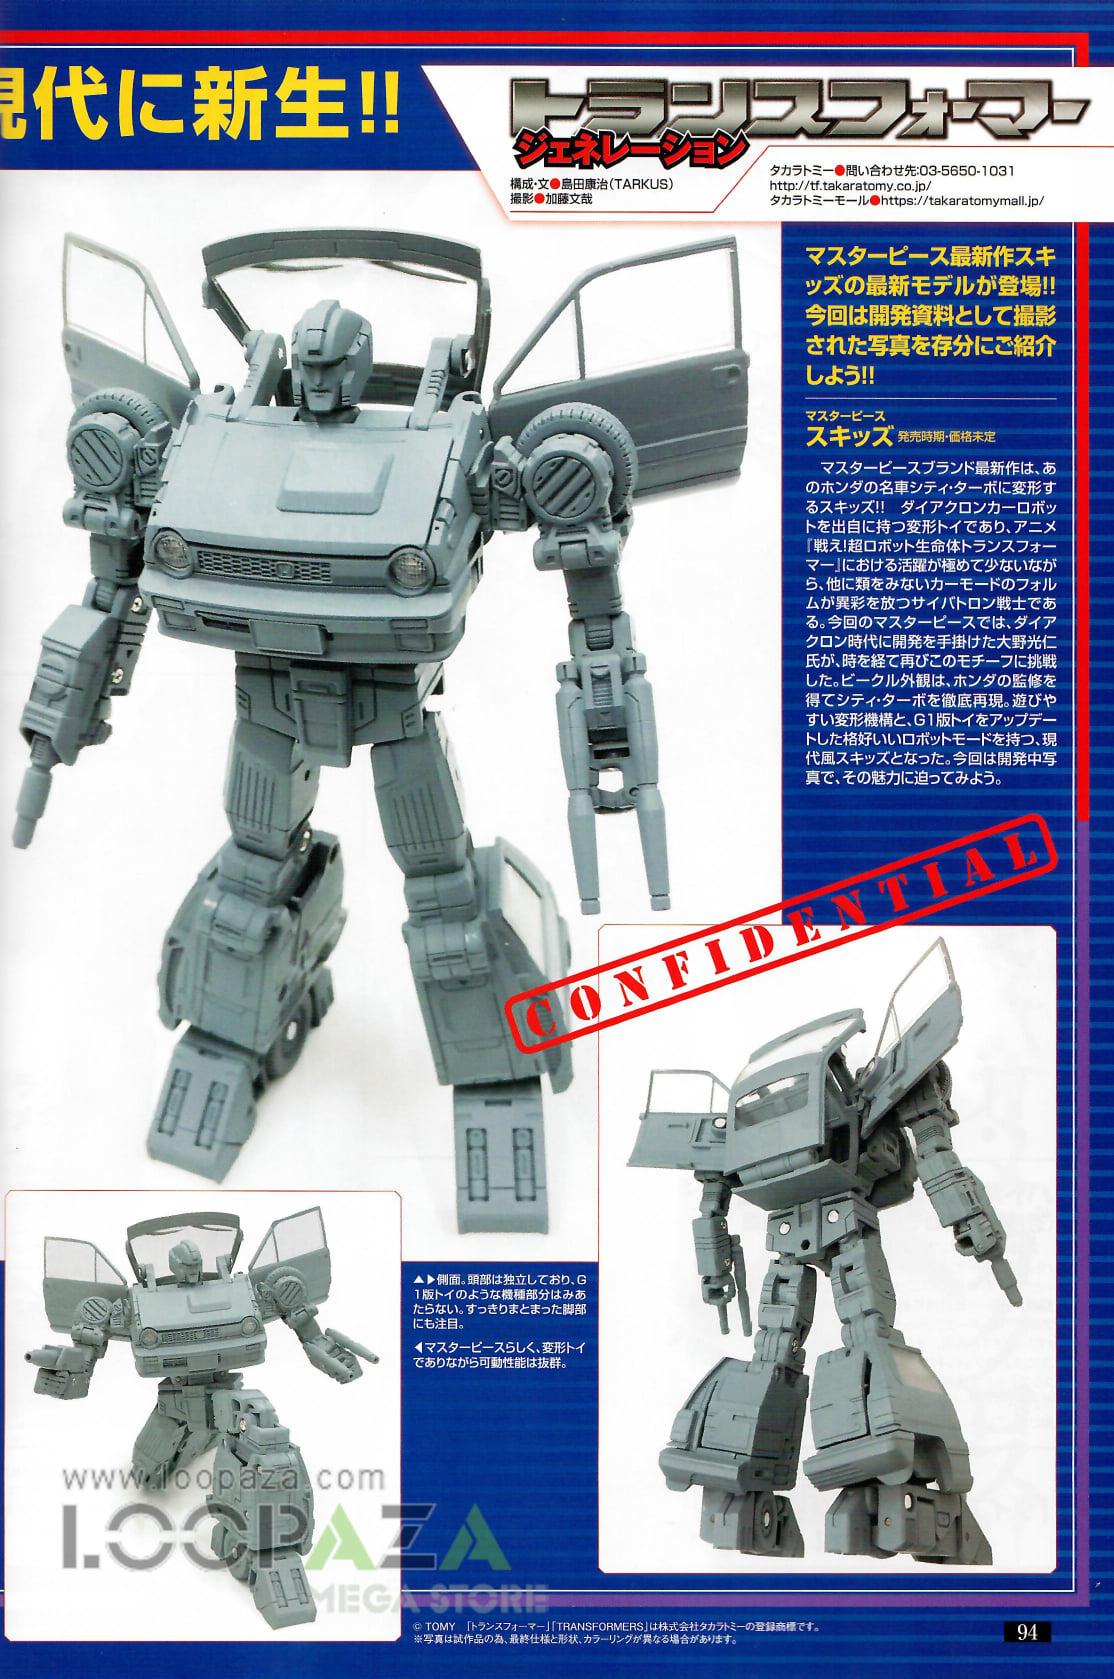 01-Figure-King-No.-277-Transformers.jpg